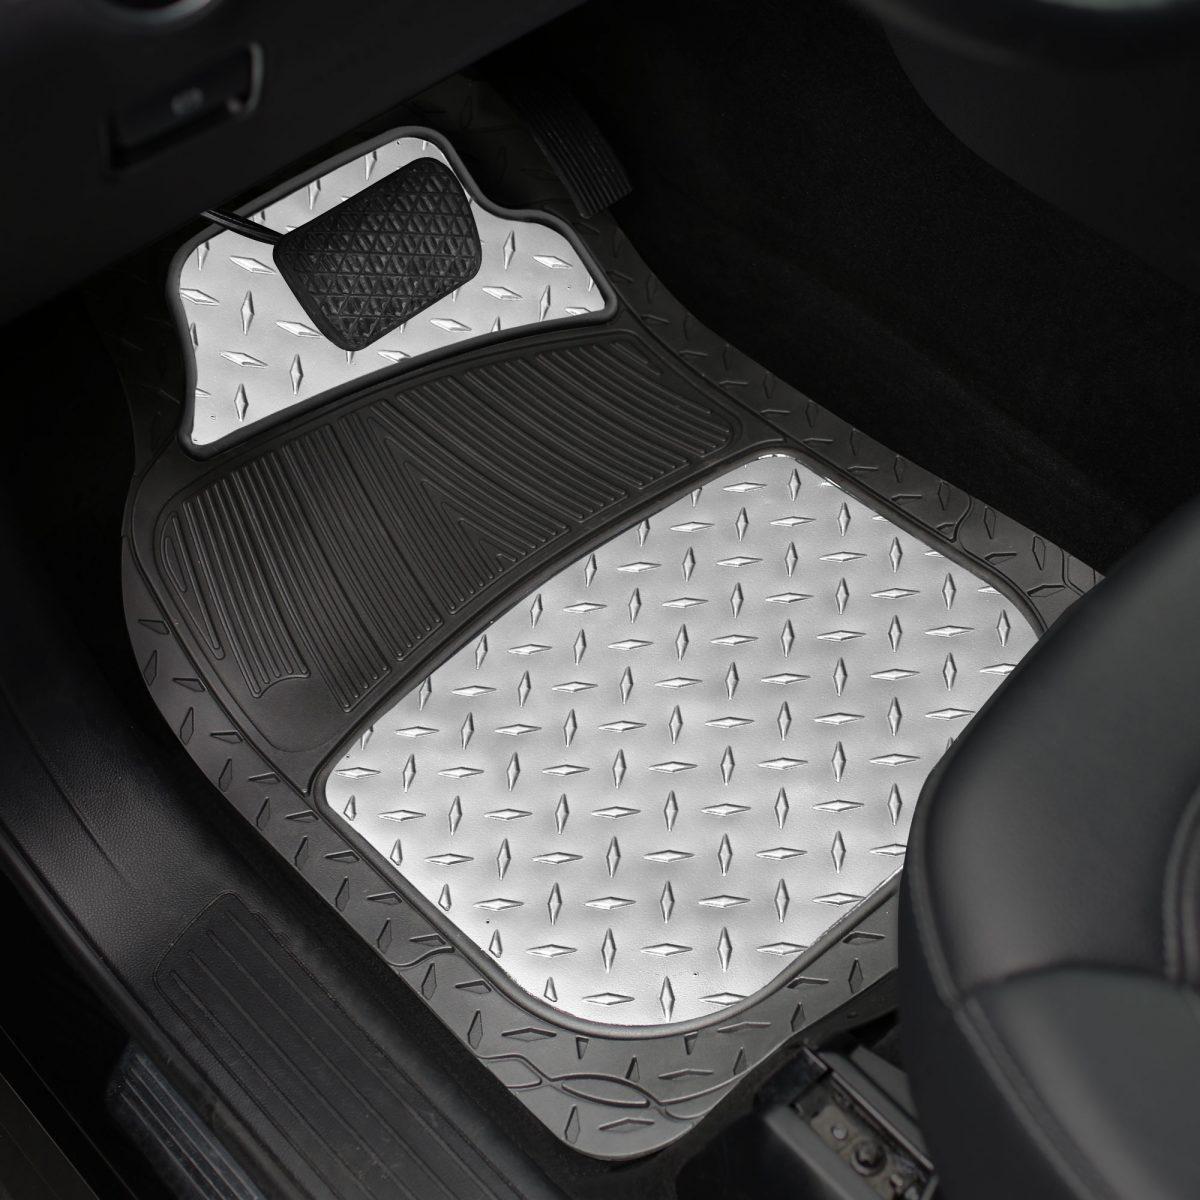 f11315_silver_interior car floor mats